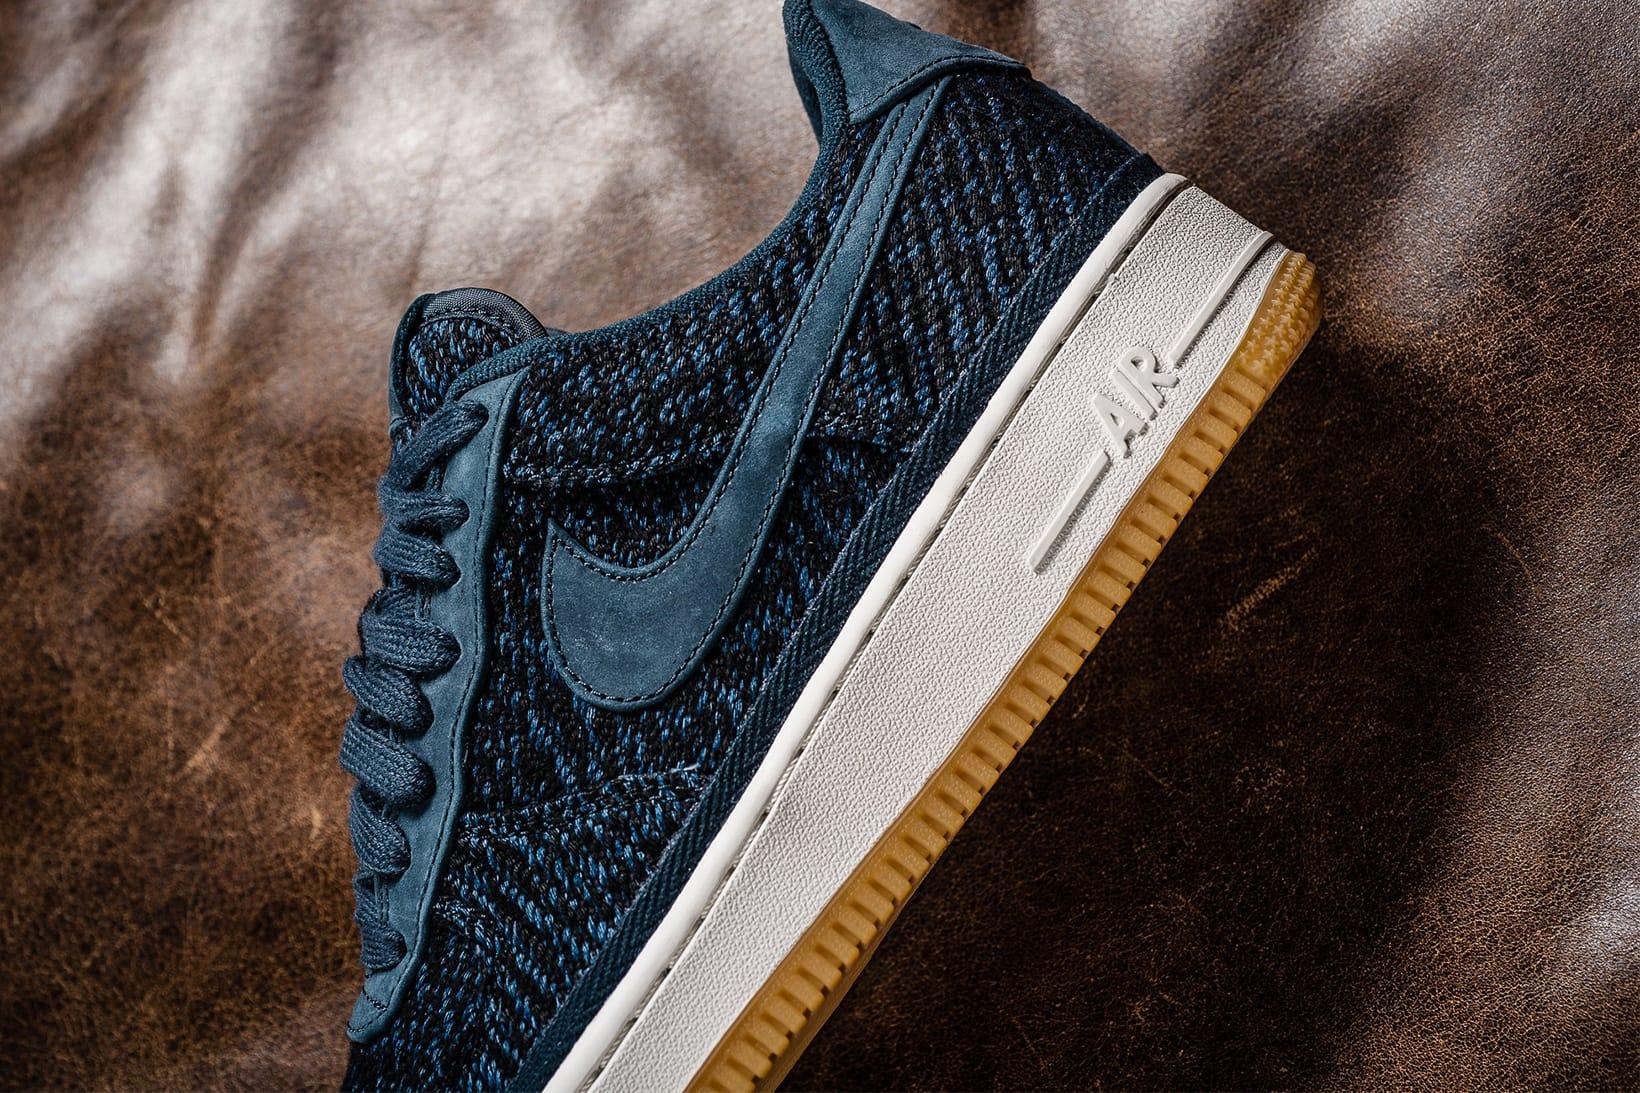 Nike Air Force 1 Low '07 in Indigo Wool